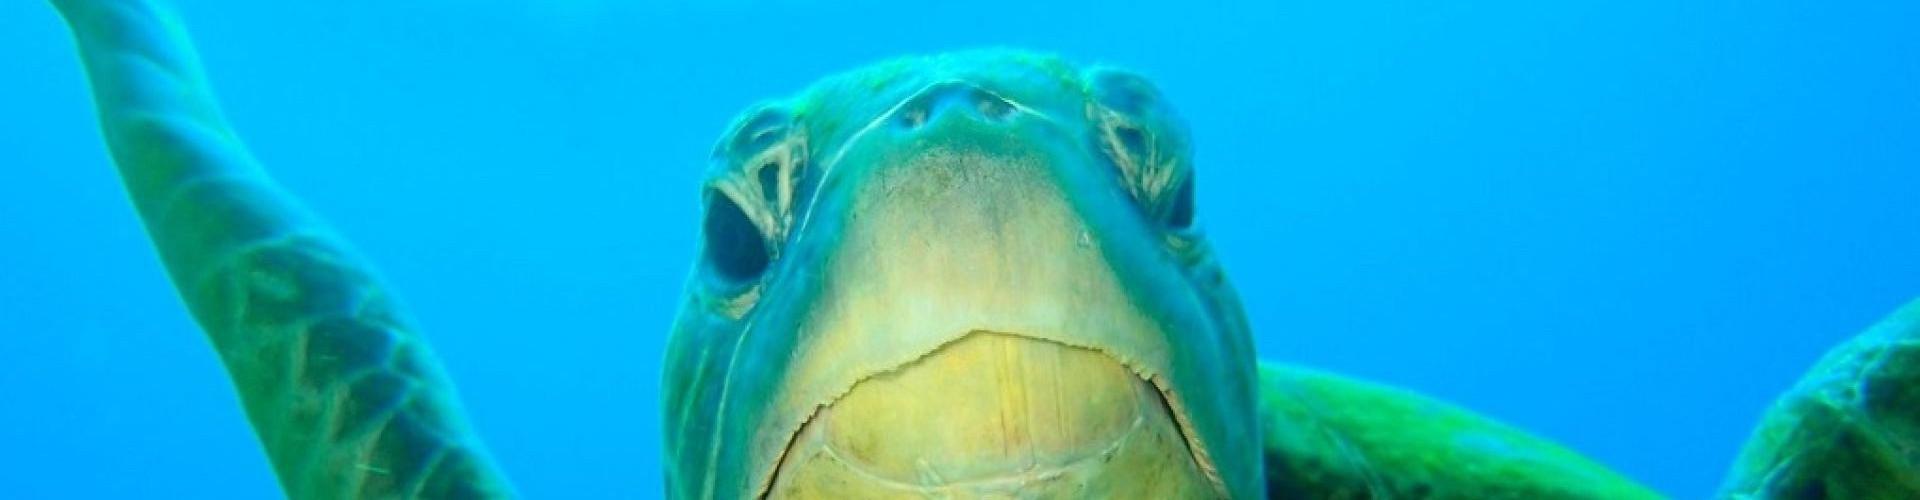 3-Become a Scuba Diver